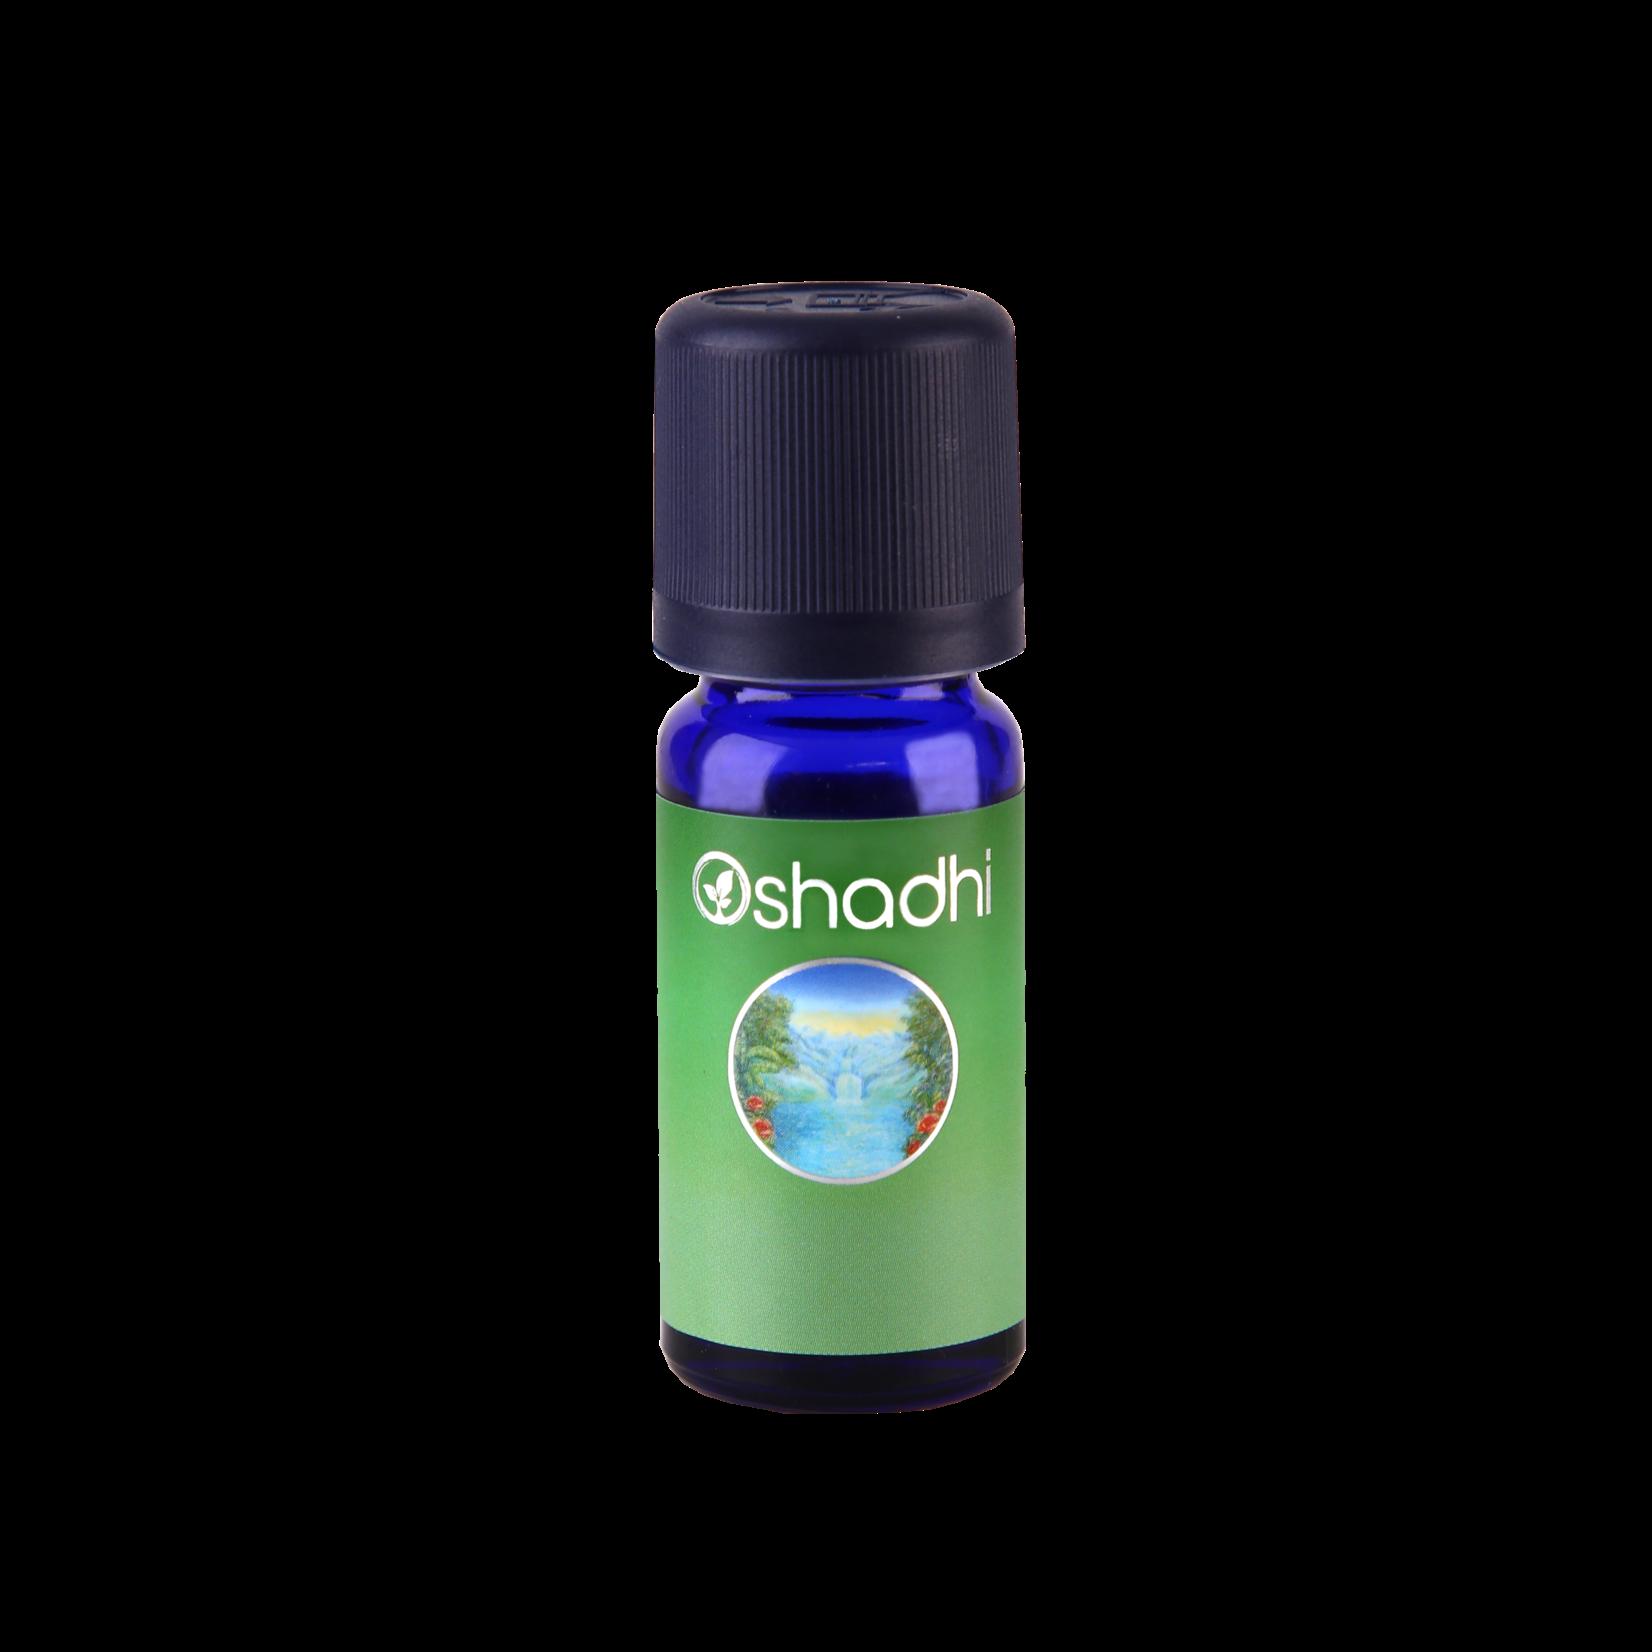 Oshadhi Synergie Herfstgloed Oshadhi - nieuwe kracht en energie bij herfstdipje 10ml